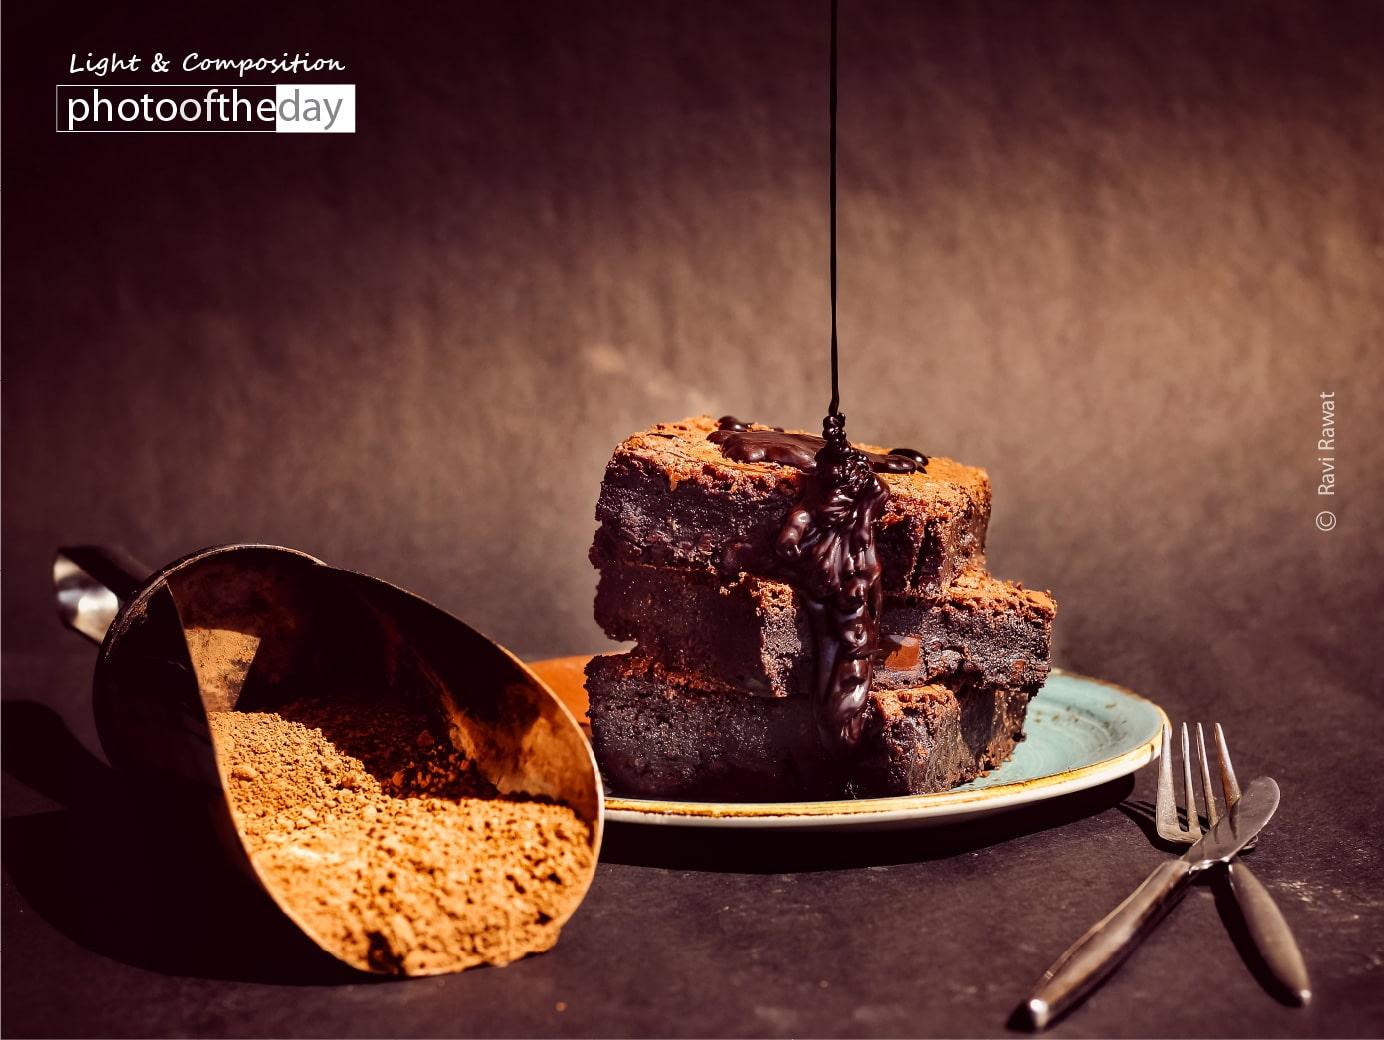 Signature Chocolate Brownie by Ravi Rawat